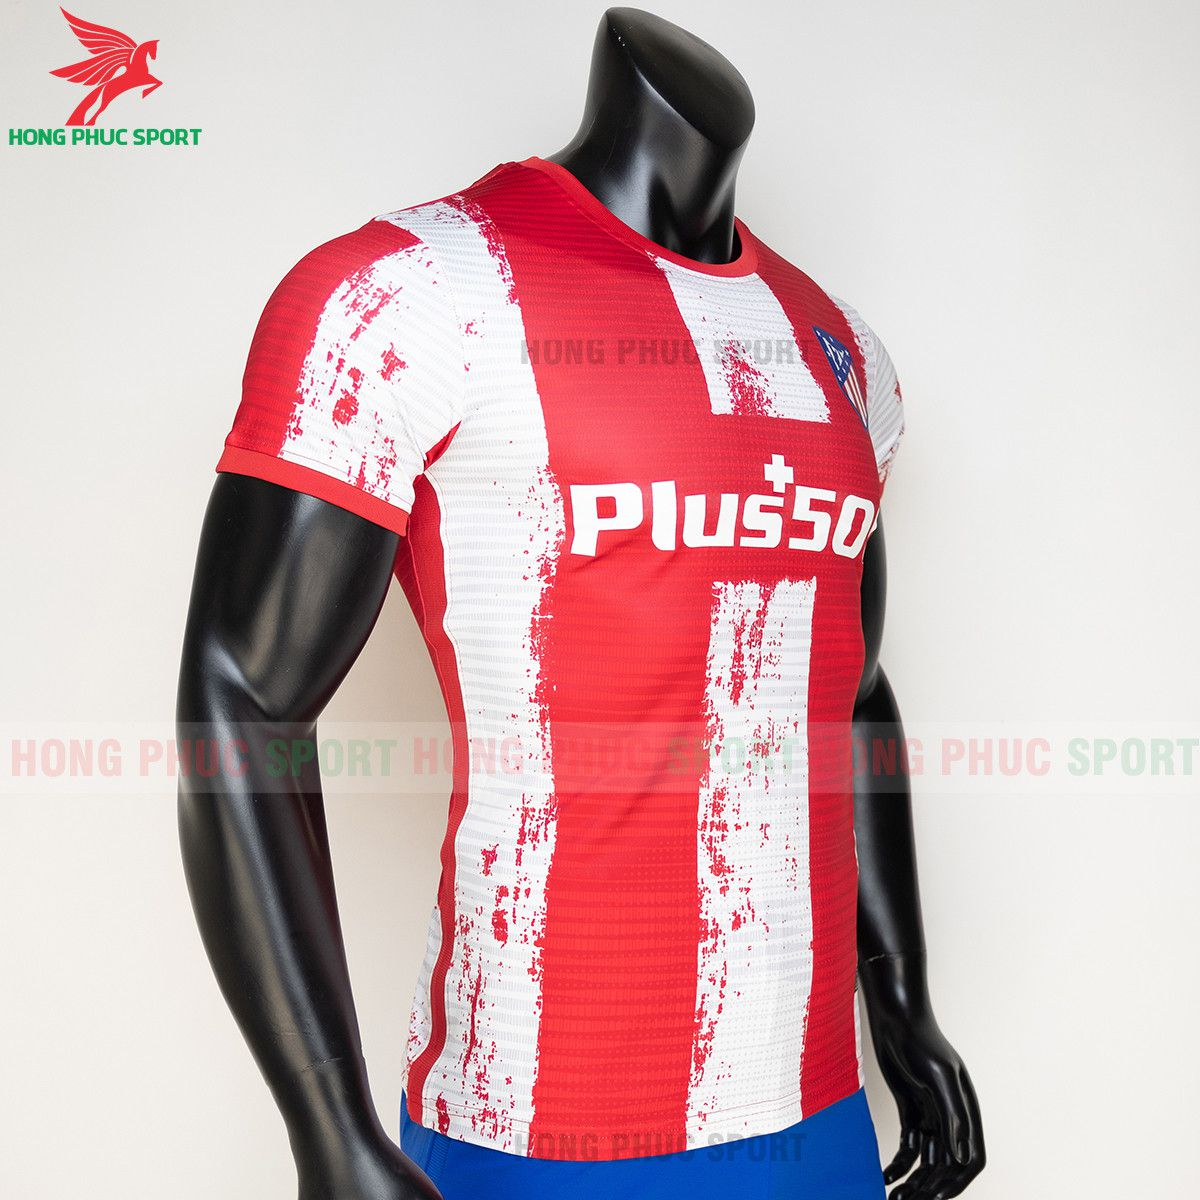 https://cdn.hongphucsport.com/unsafe/s4.shopbay.vn/files/285/ao-bong-da-atletico-madrid-2021-22-san-nha-thailand-5-61558e99b2c1c.jpg